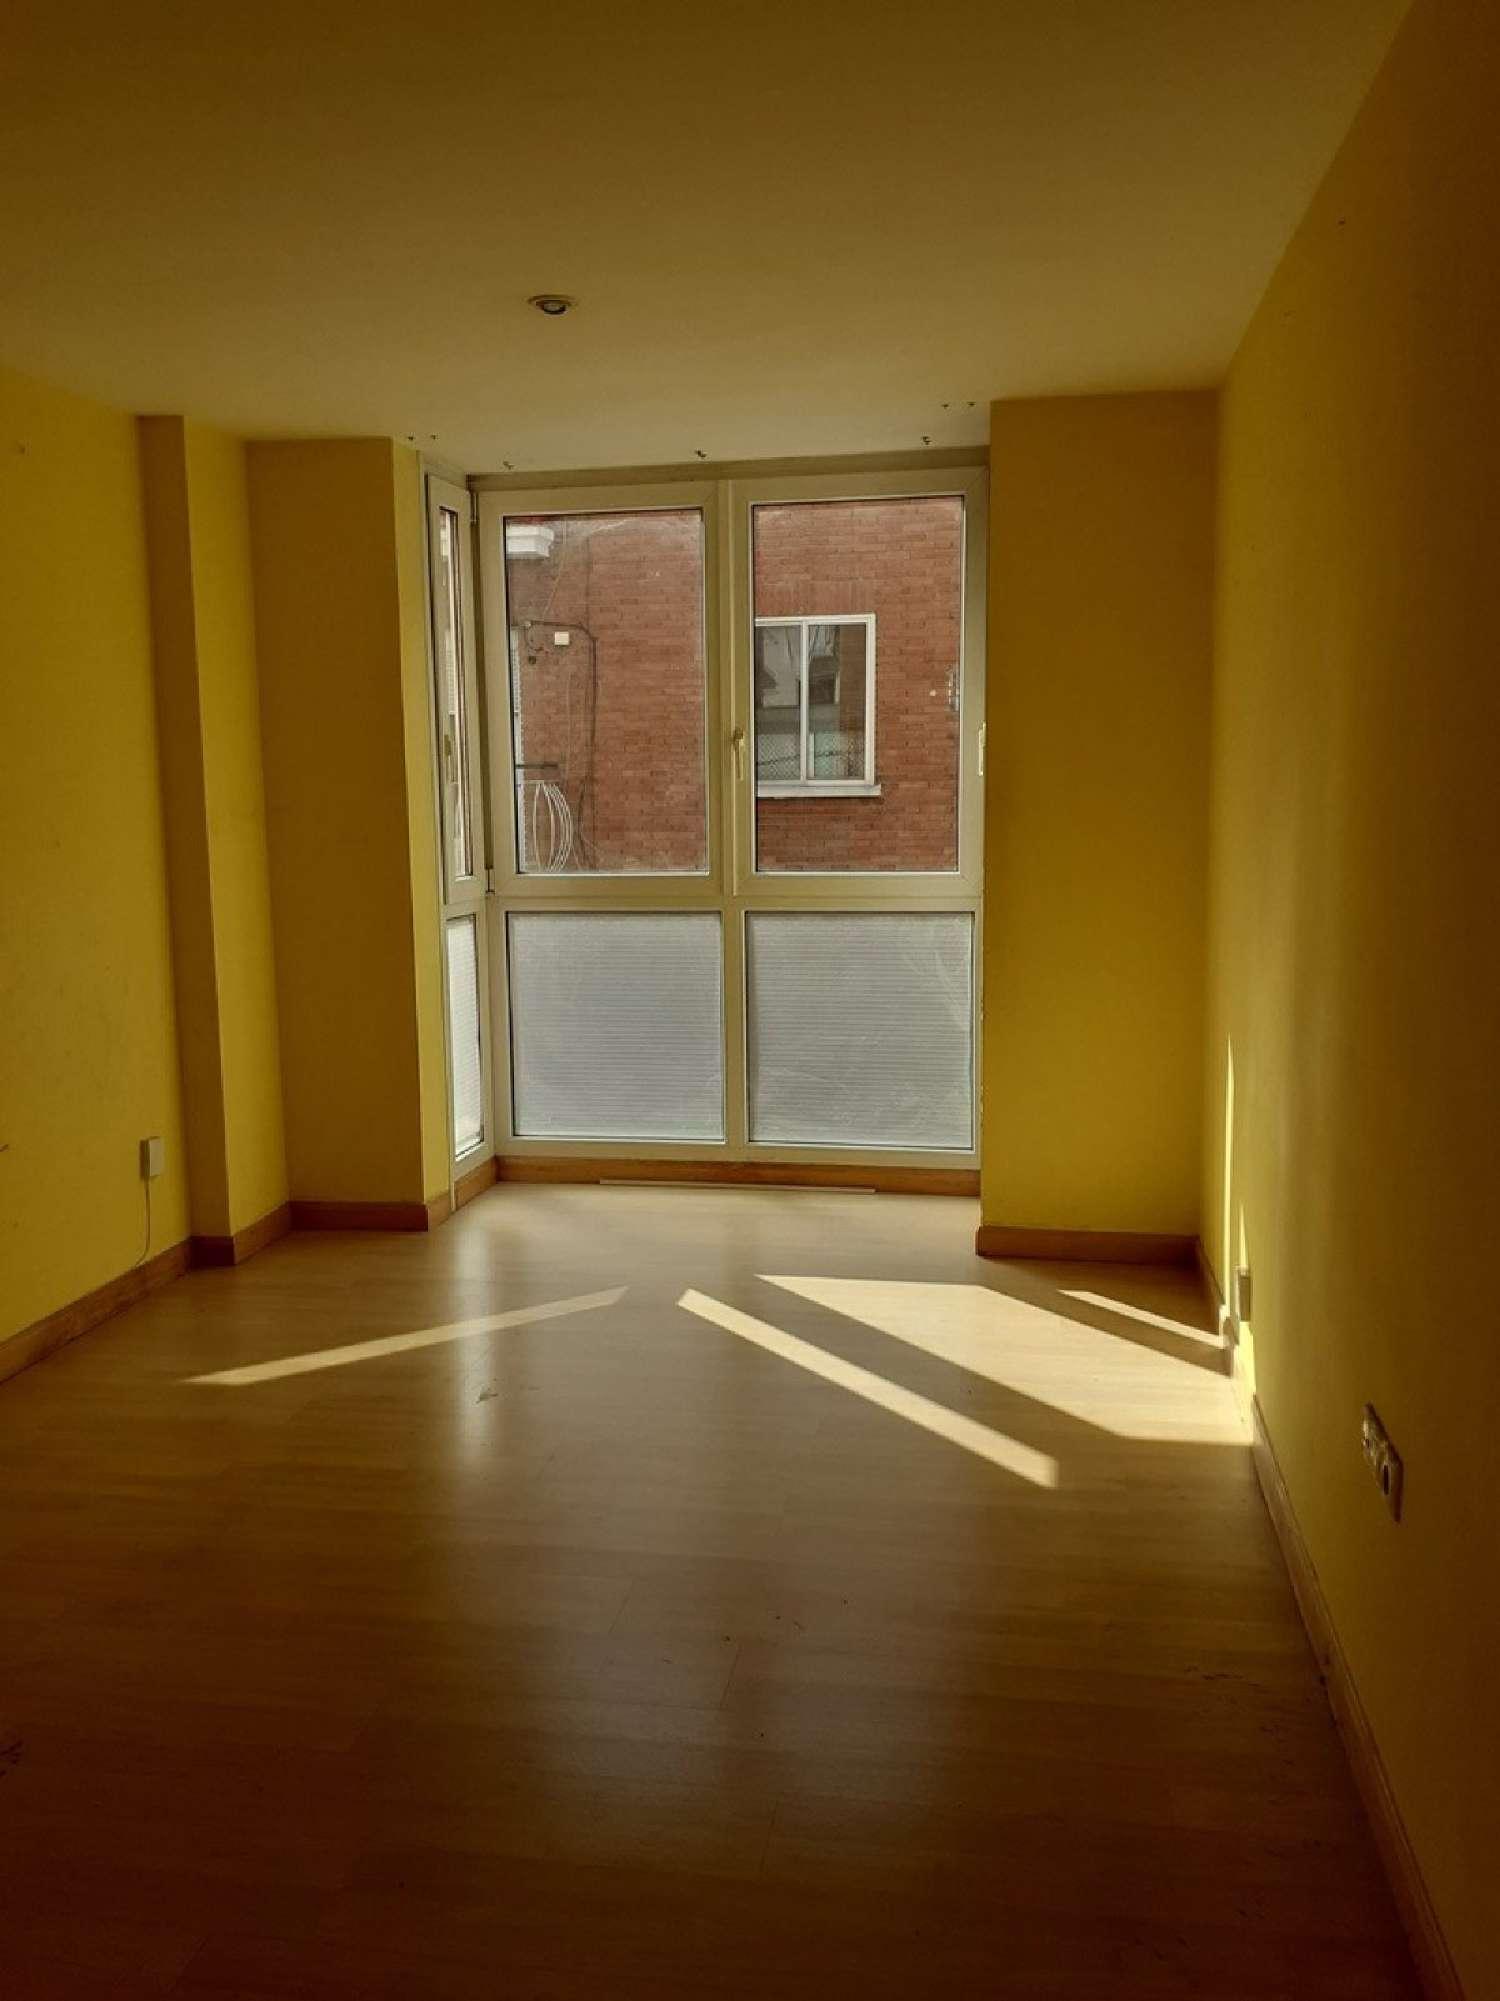 fuencarral-pilar madrid piso foto 4015205